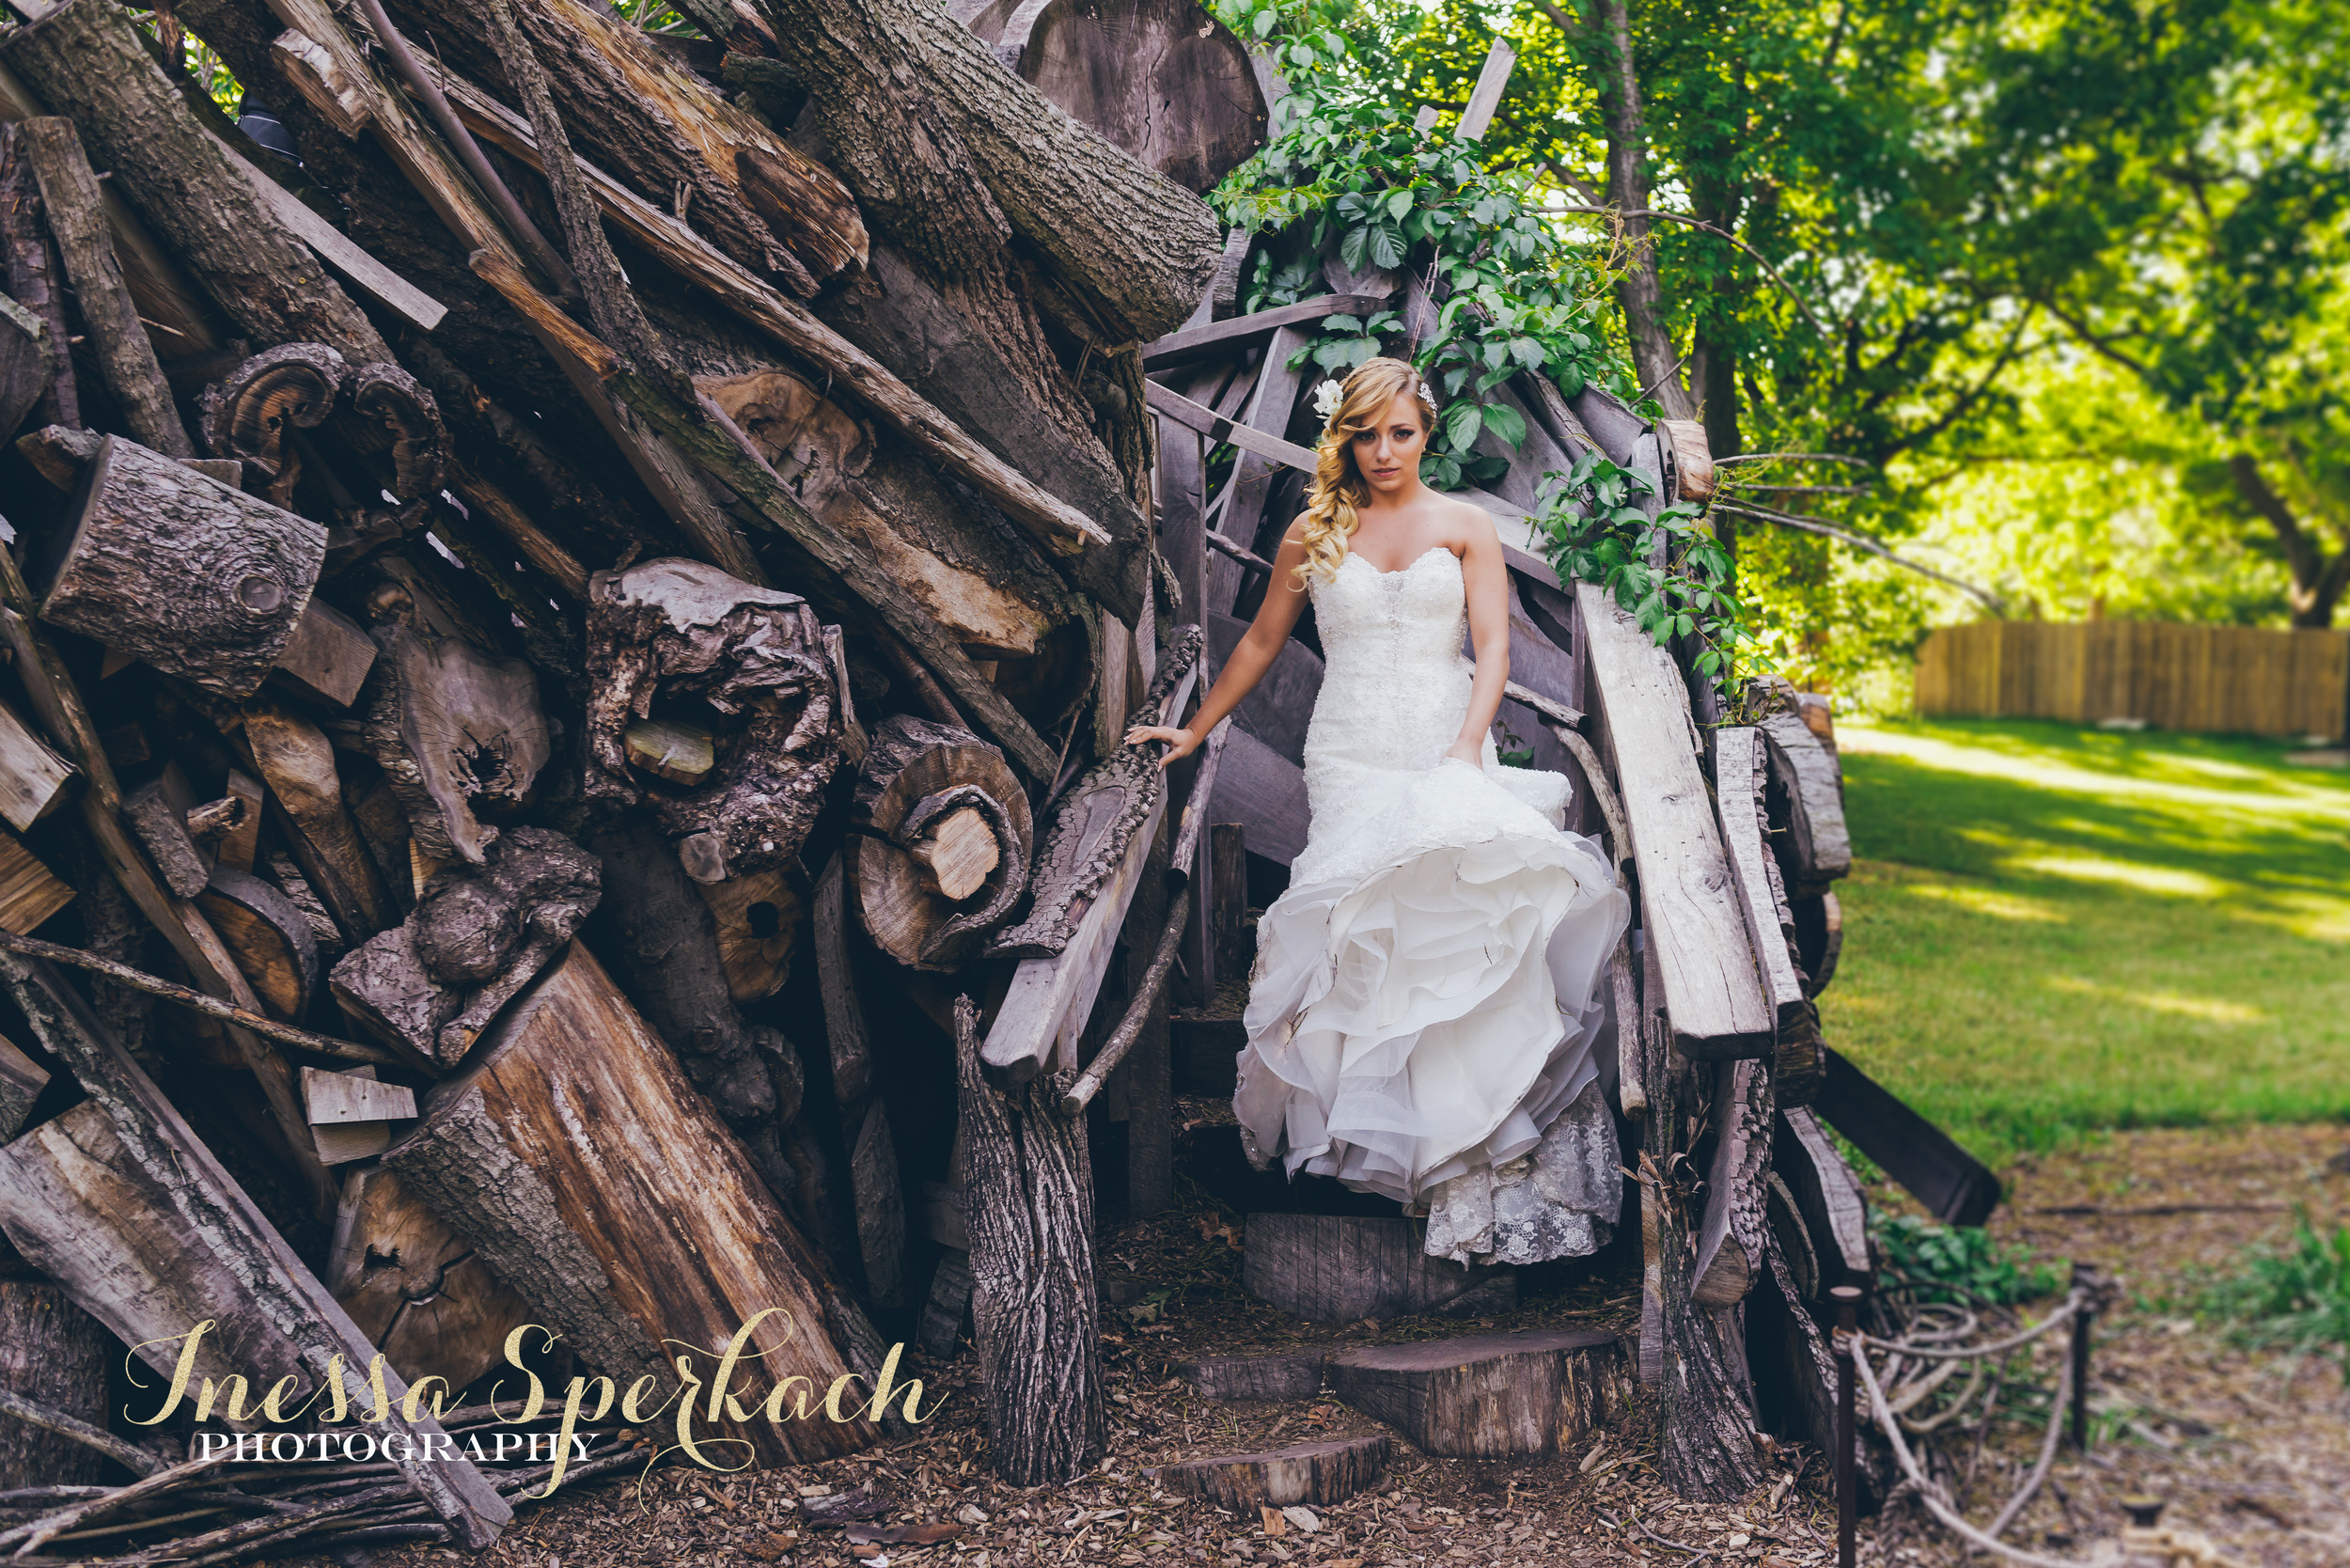 InessaSperkachPhotography-0098.jpg